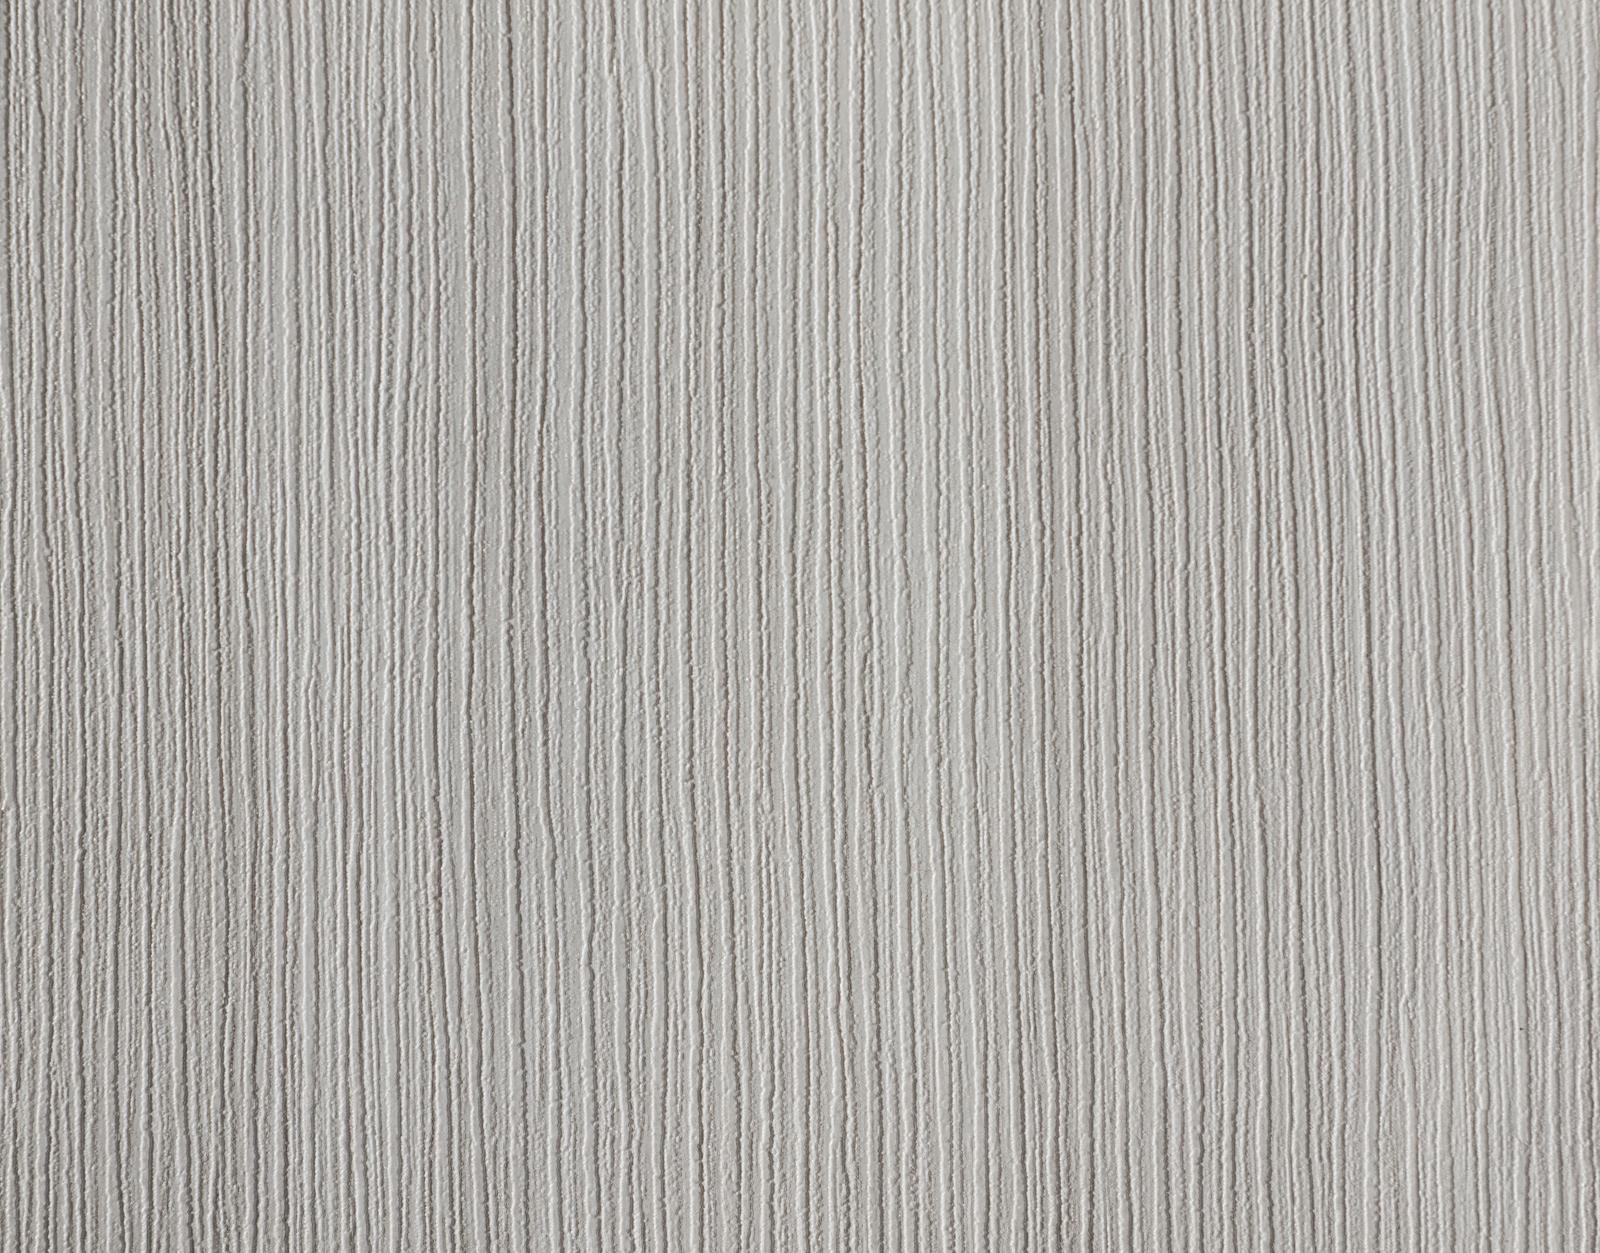 Вяз Белый MB9141-1